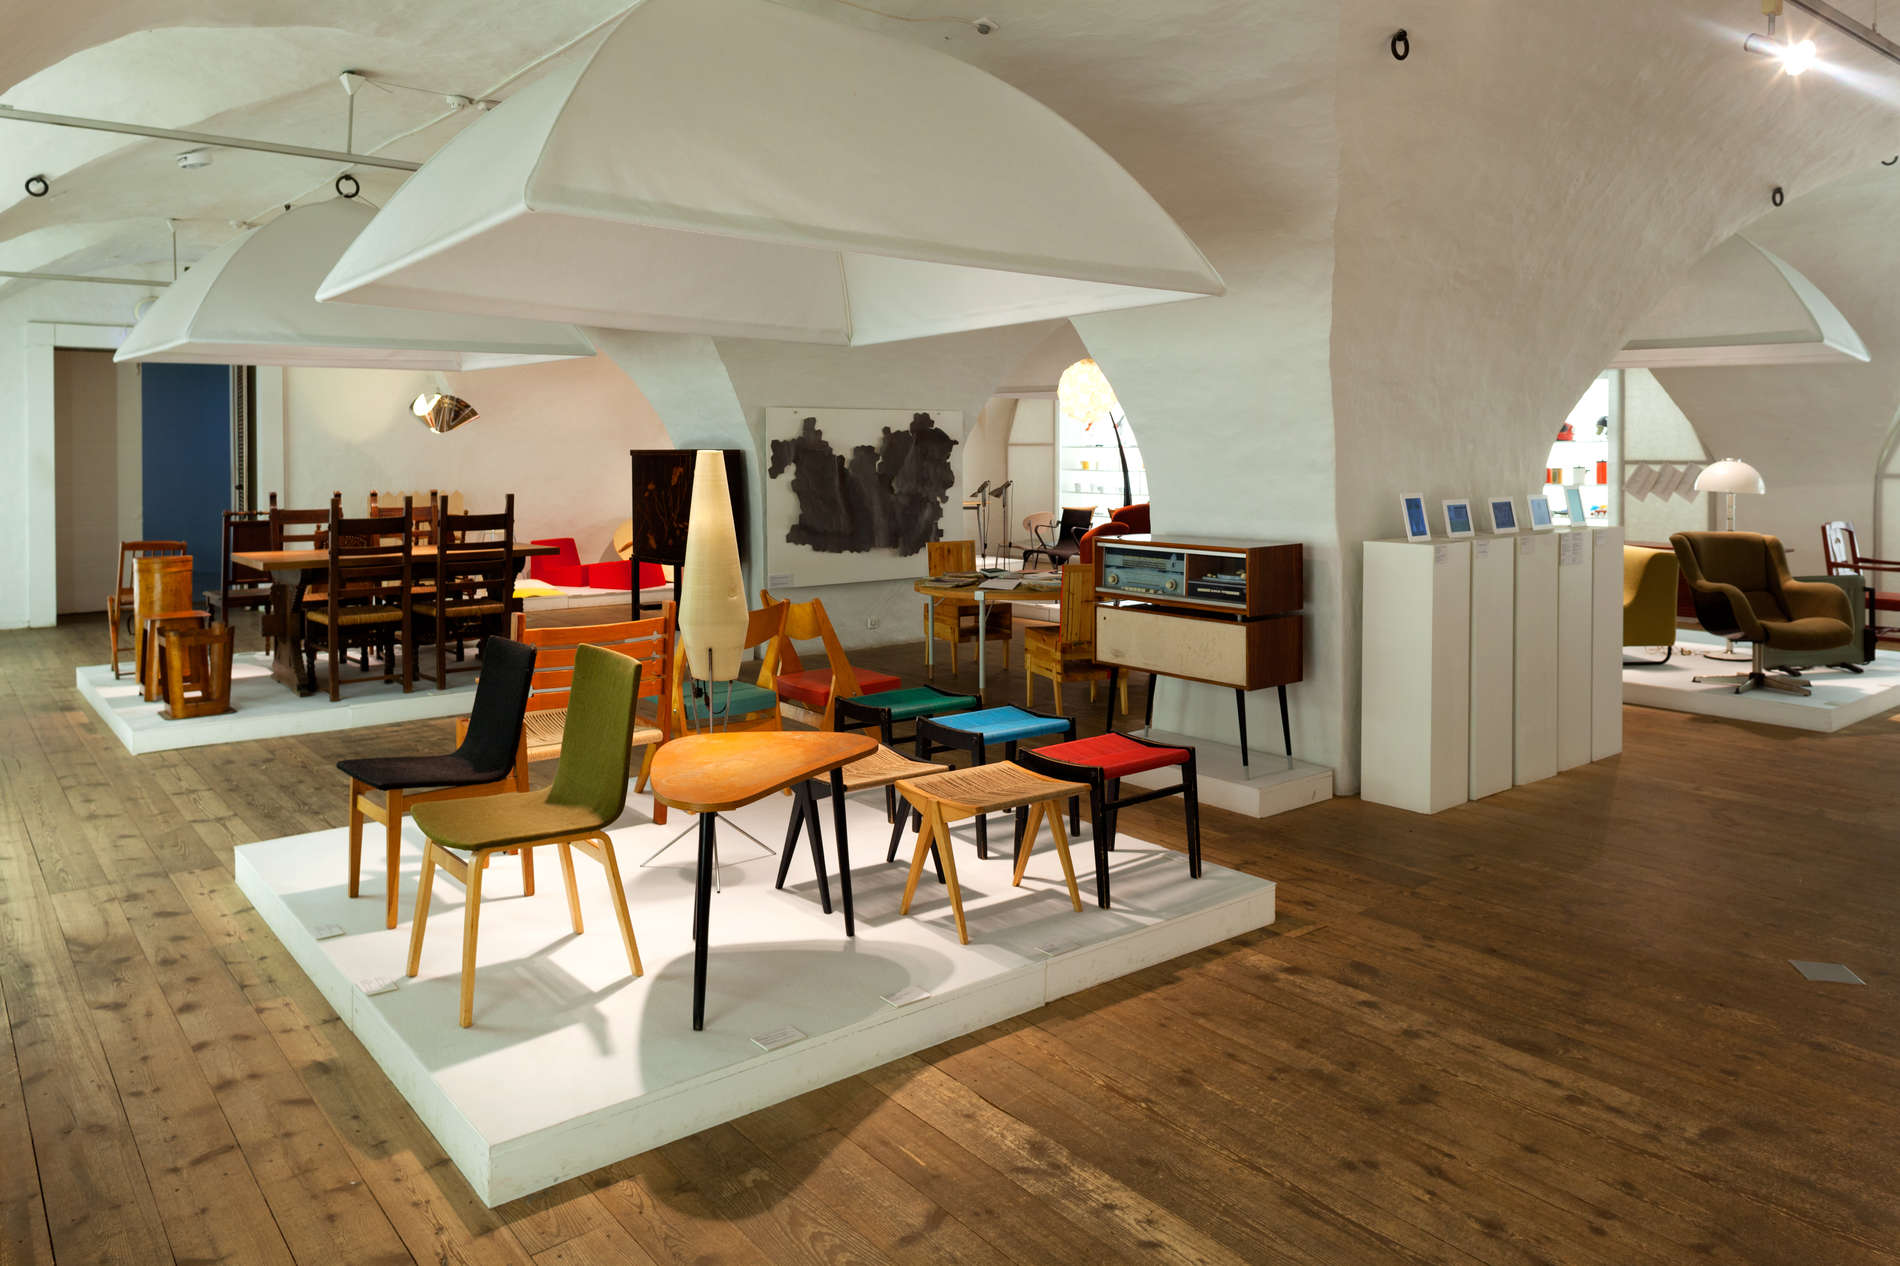 Estonian Museum of Applied Art and Design in Tallinn, Estonia